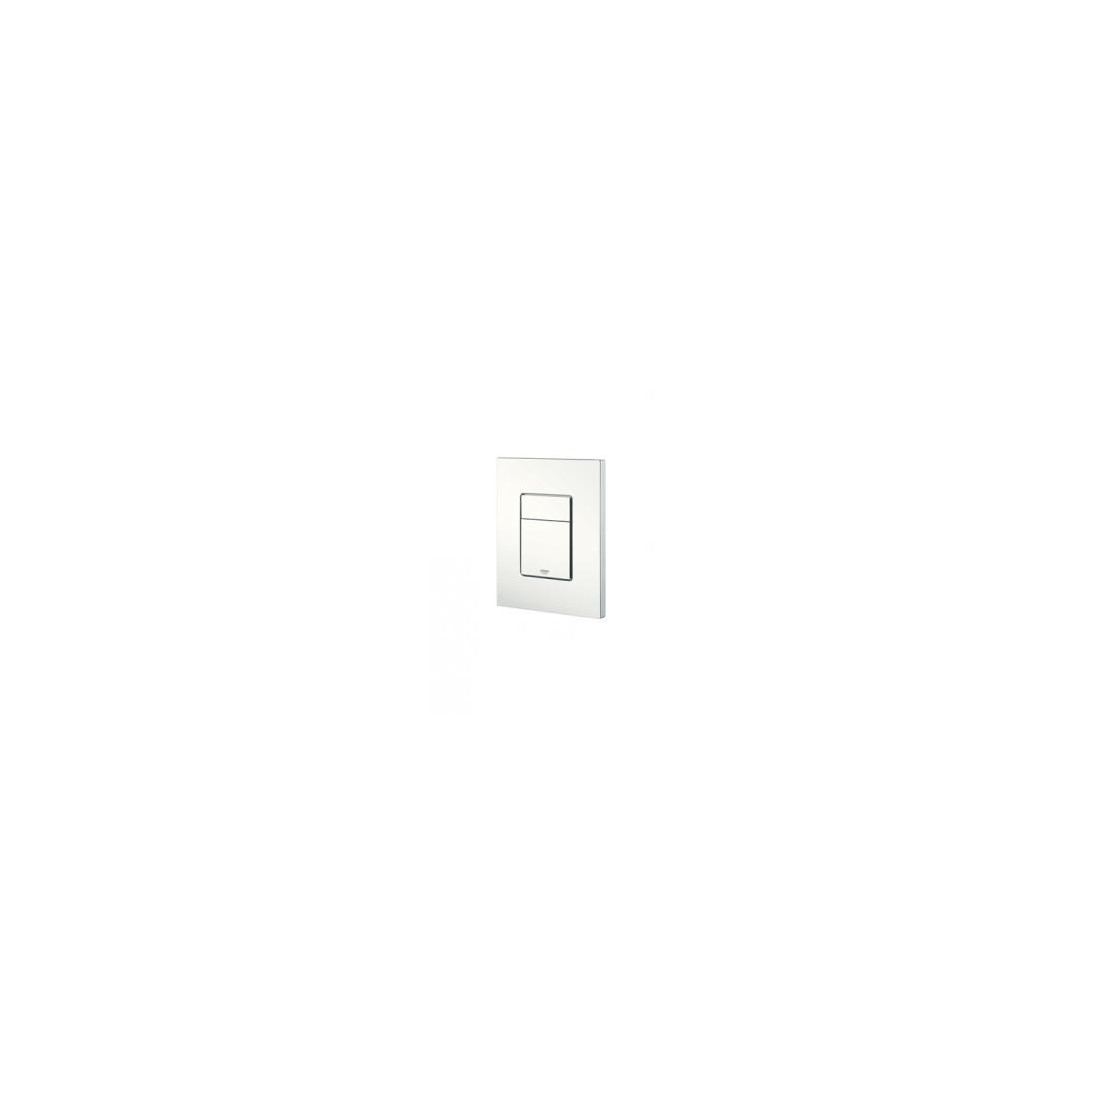 WC klavišas GROHE Skate Cosmopolitan baltas